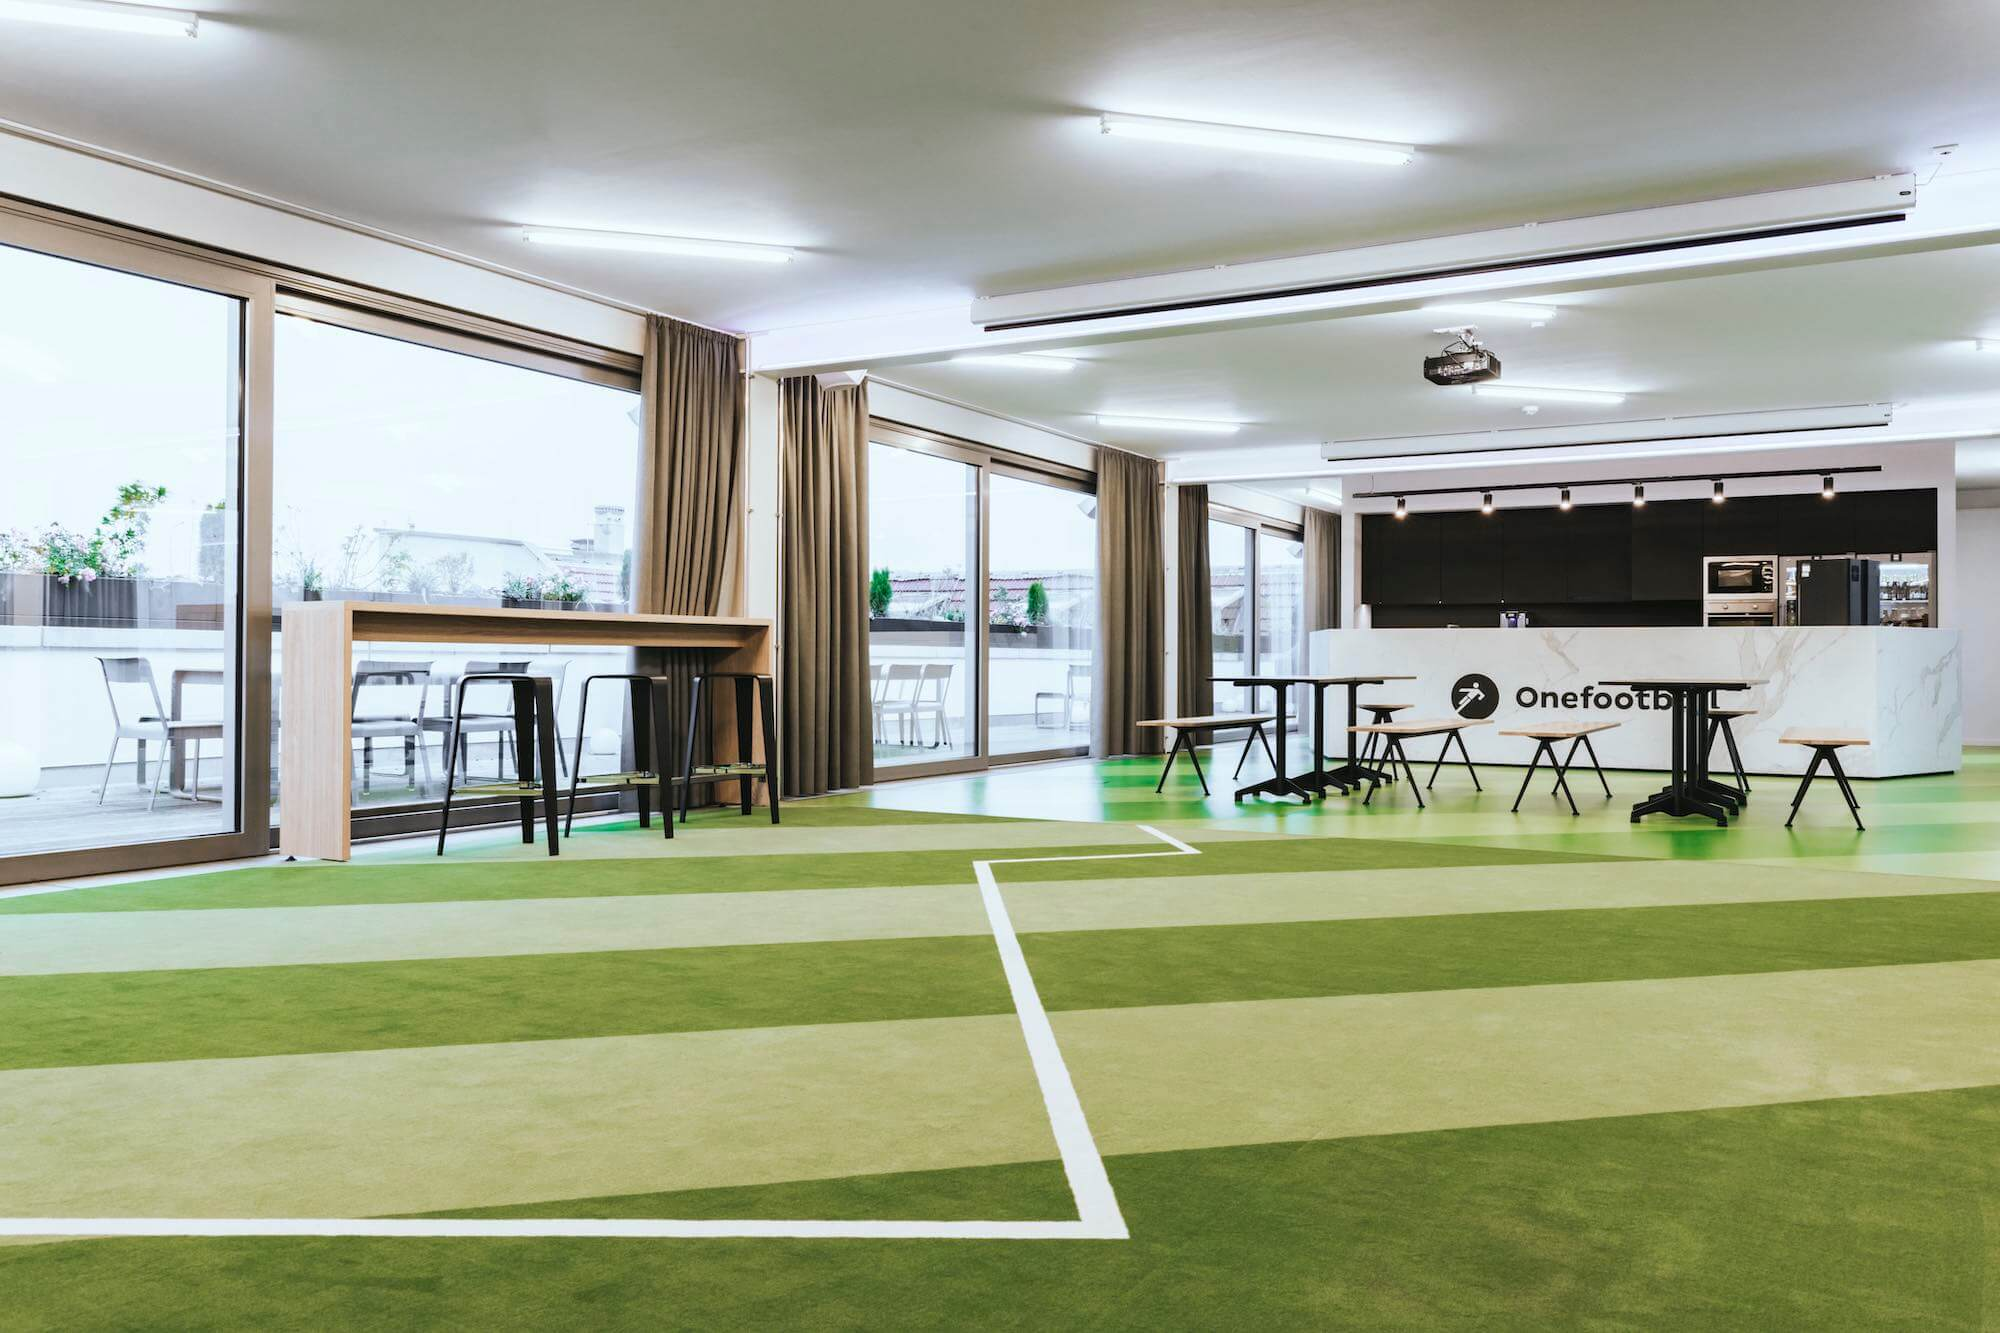 Onefootball Startup Büro TKEZ Architekten Eventfläche mit Kunstrasen